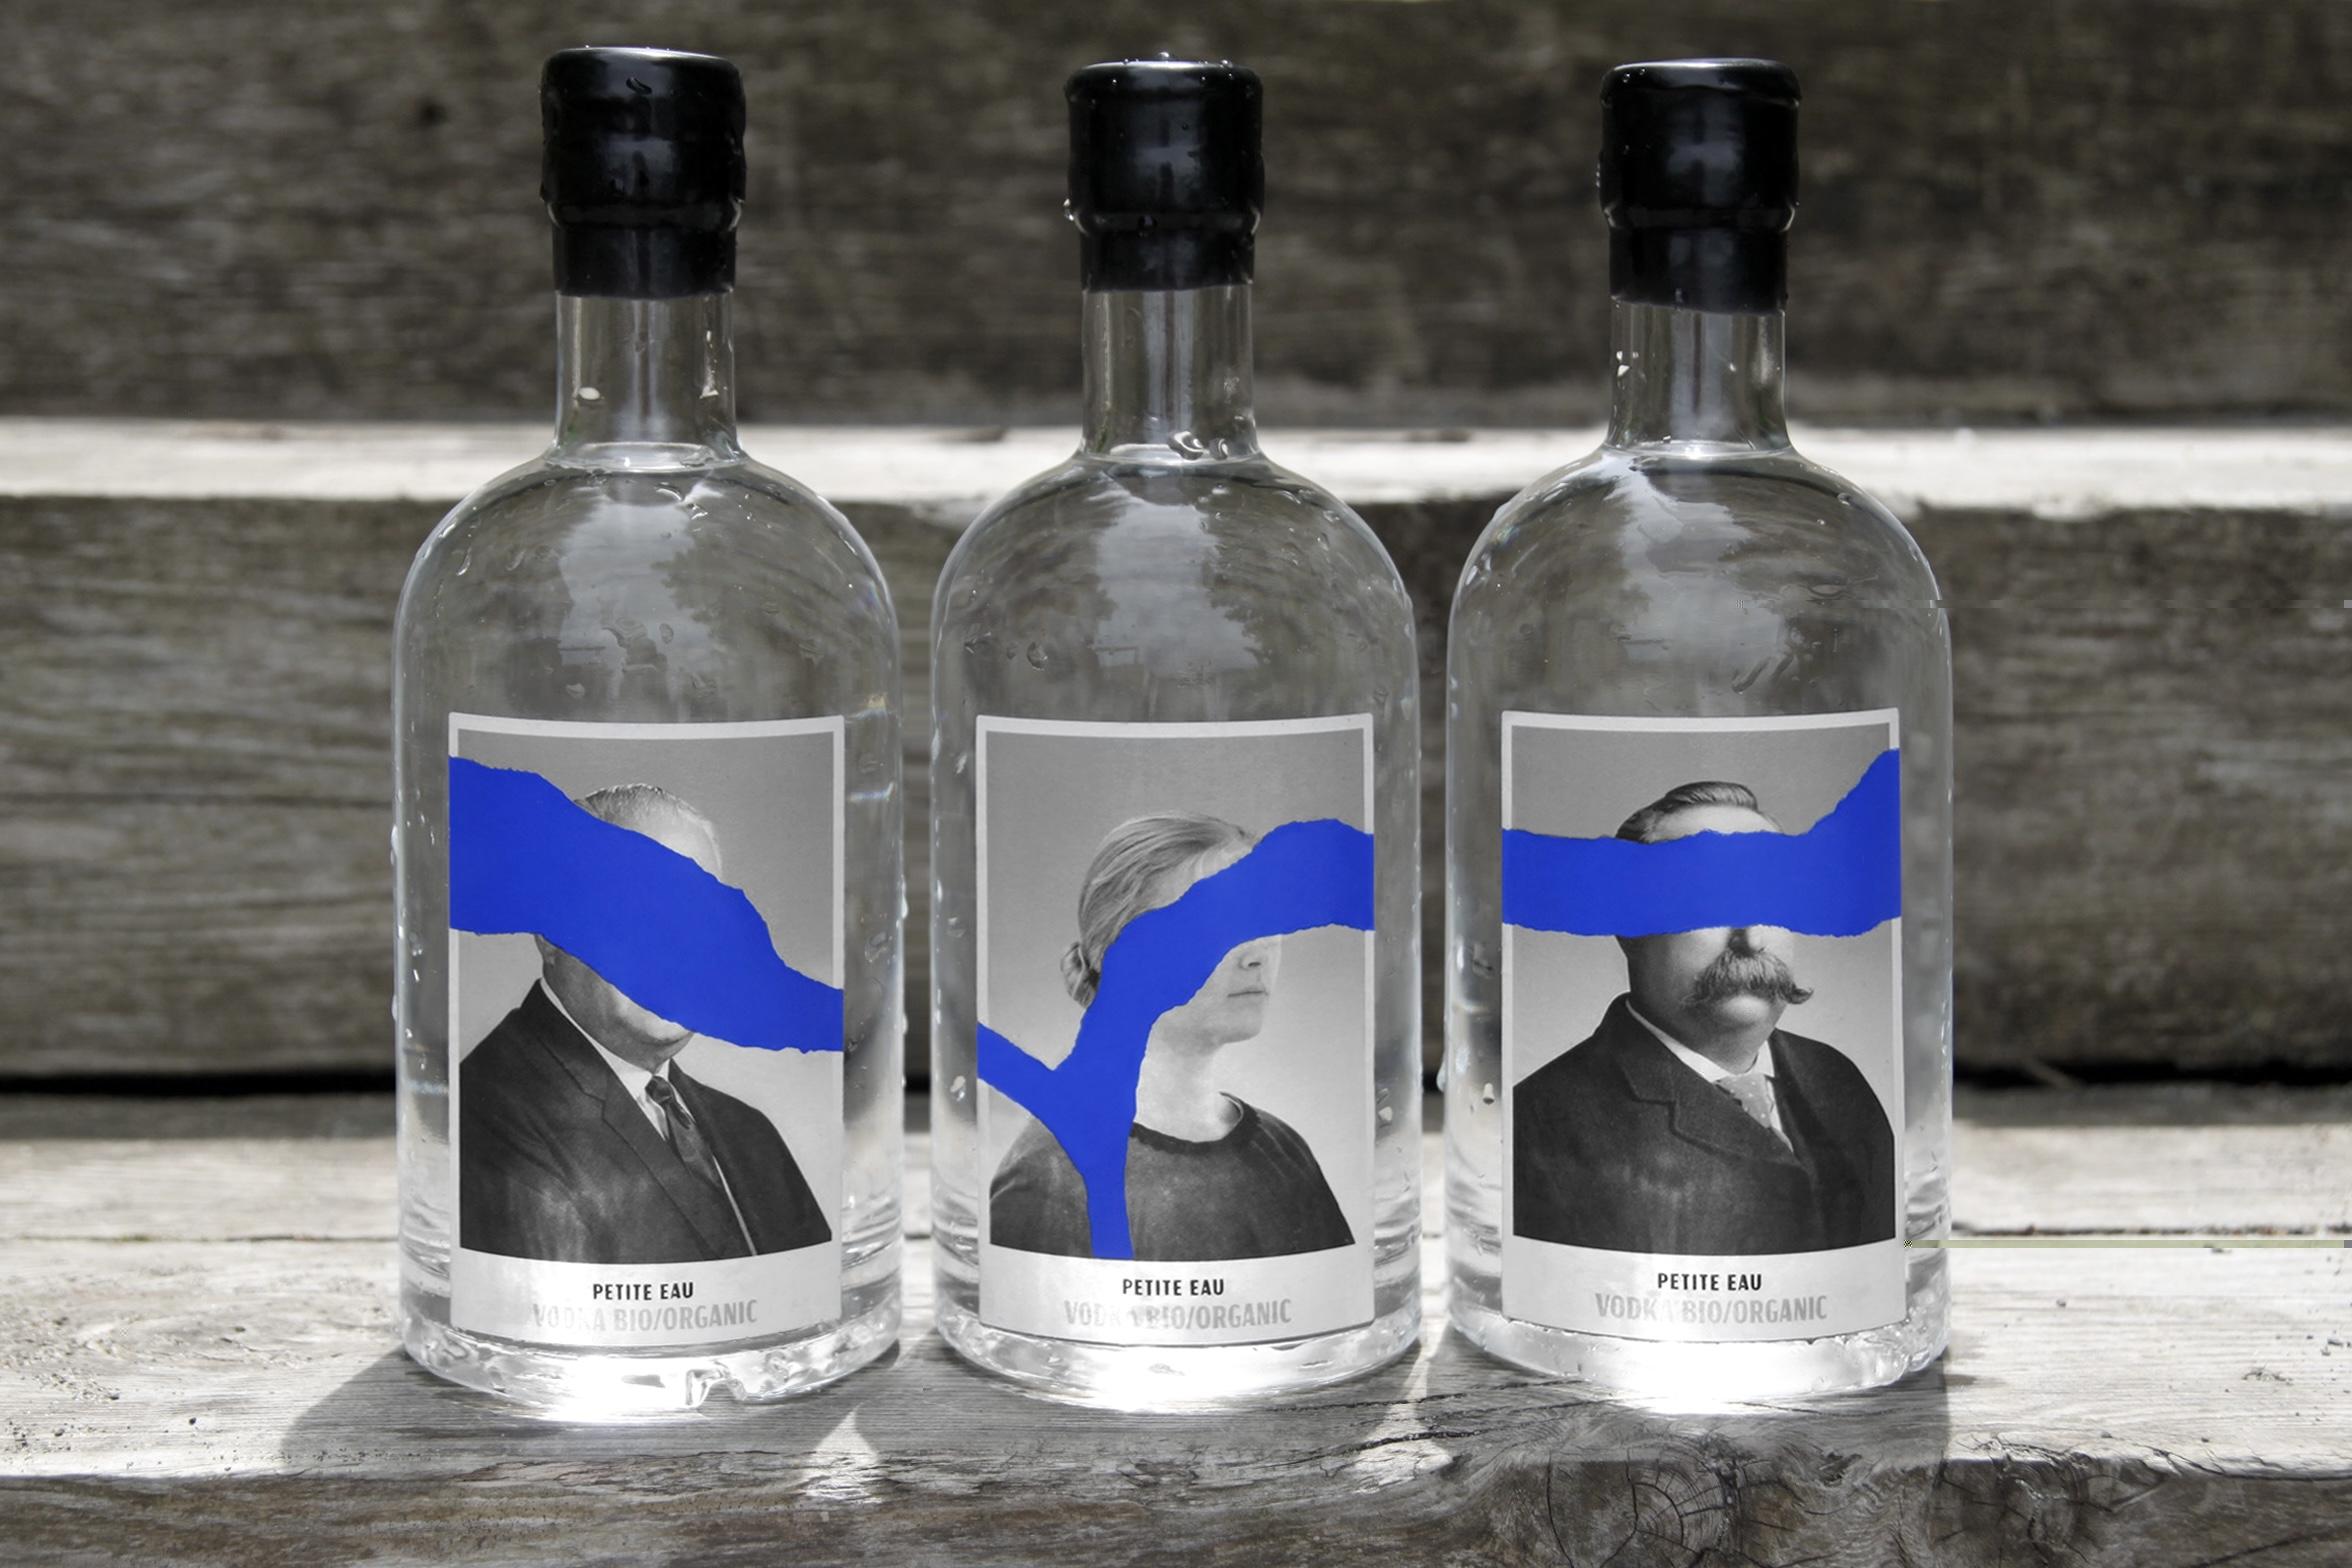 Paprika Create Branding for Petite Eau Organic Vodka from the Distillerie Grand Dérangement